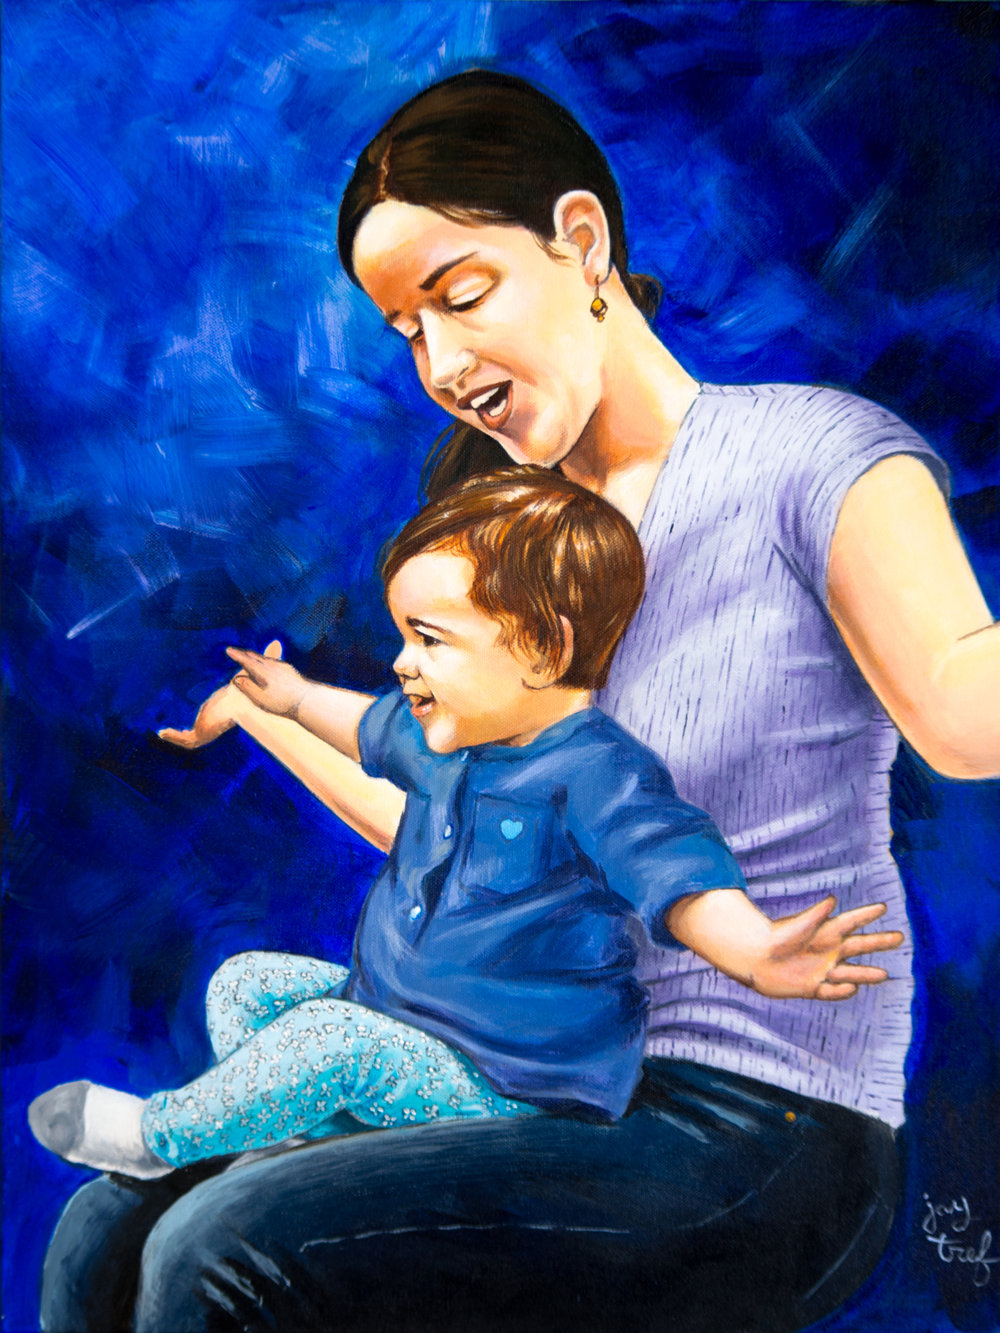 Shauna and Aubrey by Jay Trefethen. Acrylic on canvas, 18 X 24. © 2016 Jay Trefethen.